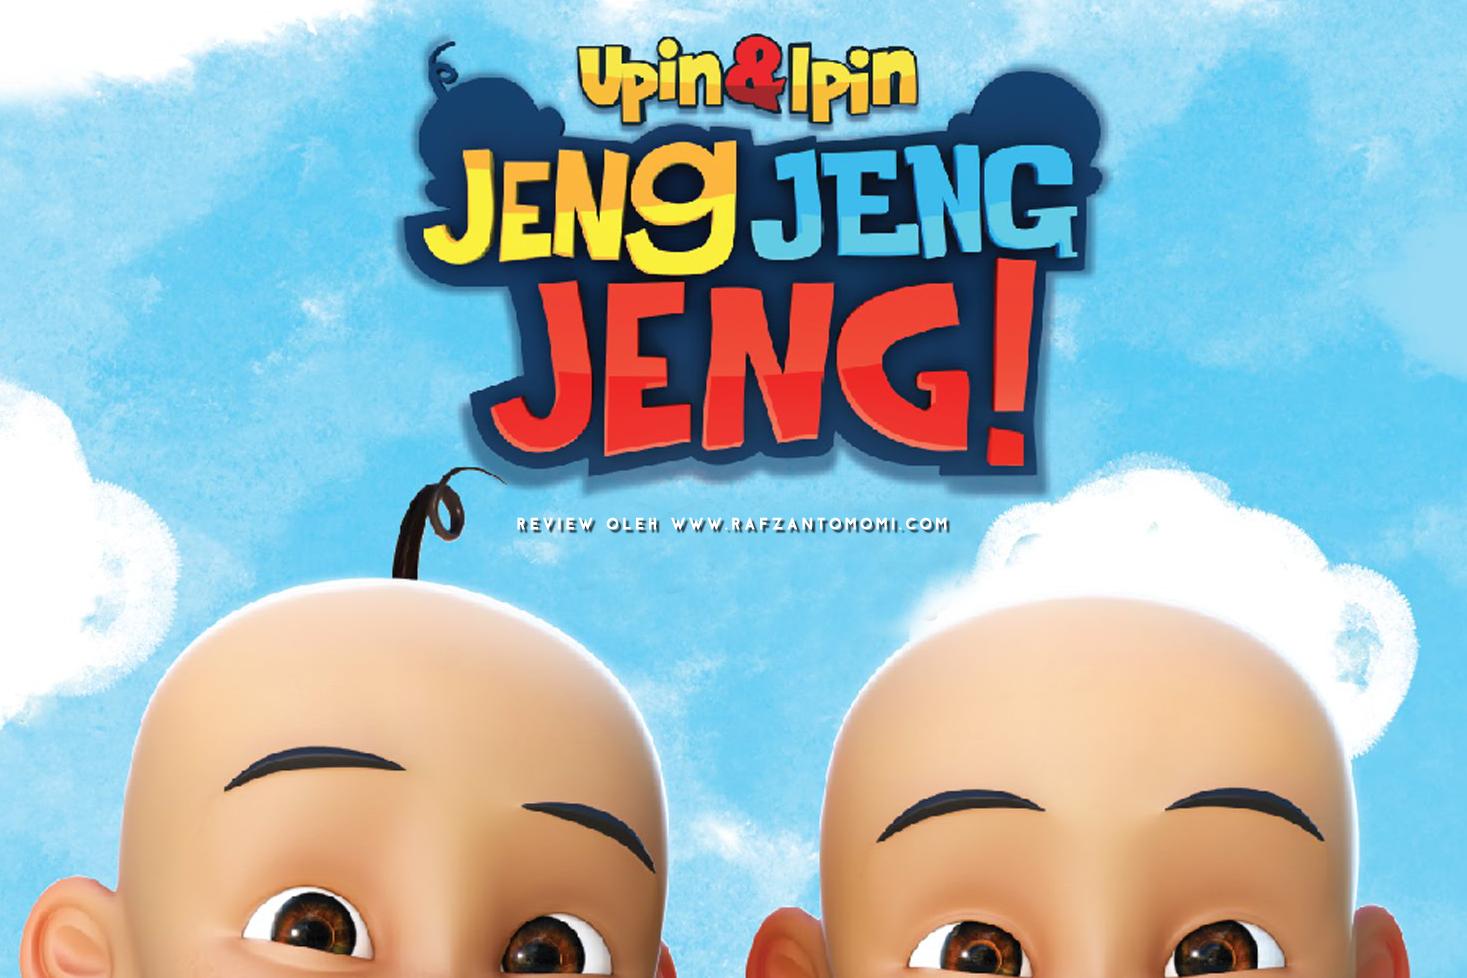 Review Filem Upin Dan Ipin: Jeng Jeng Jeng!